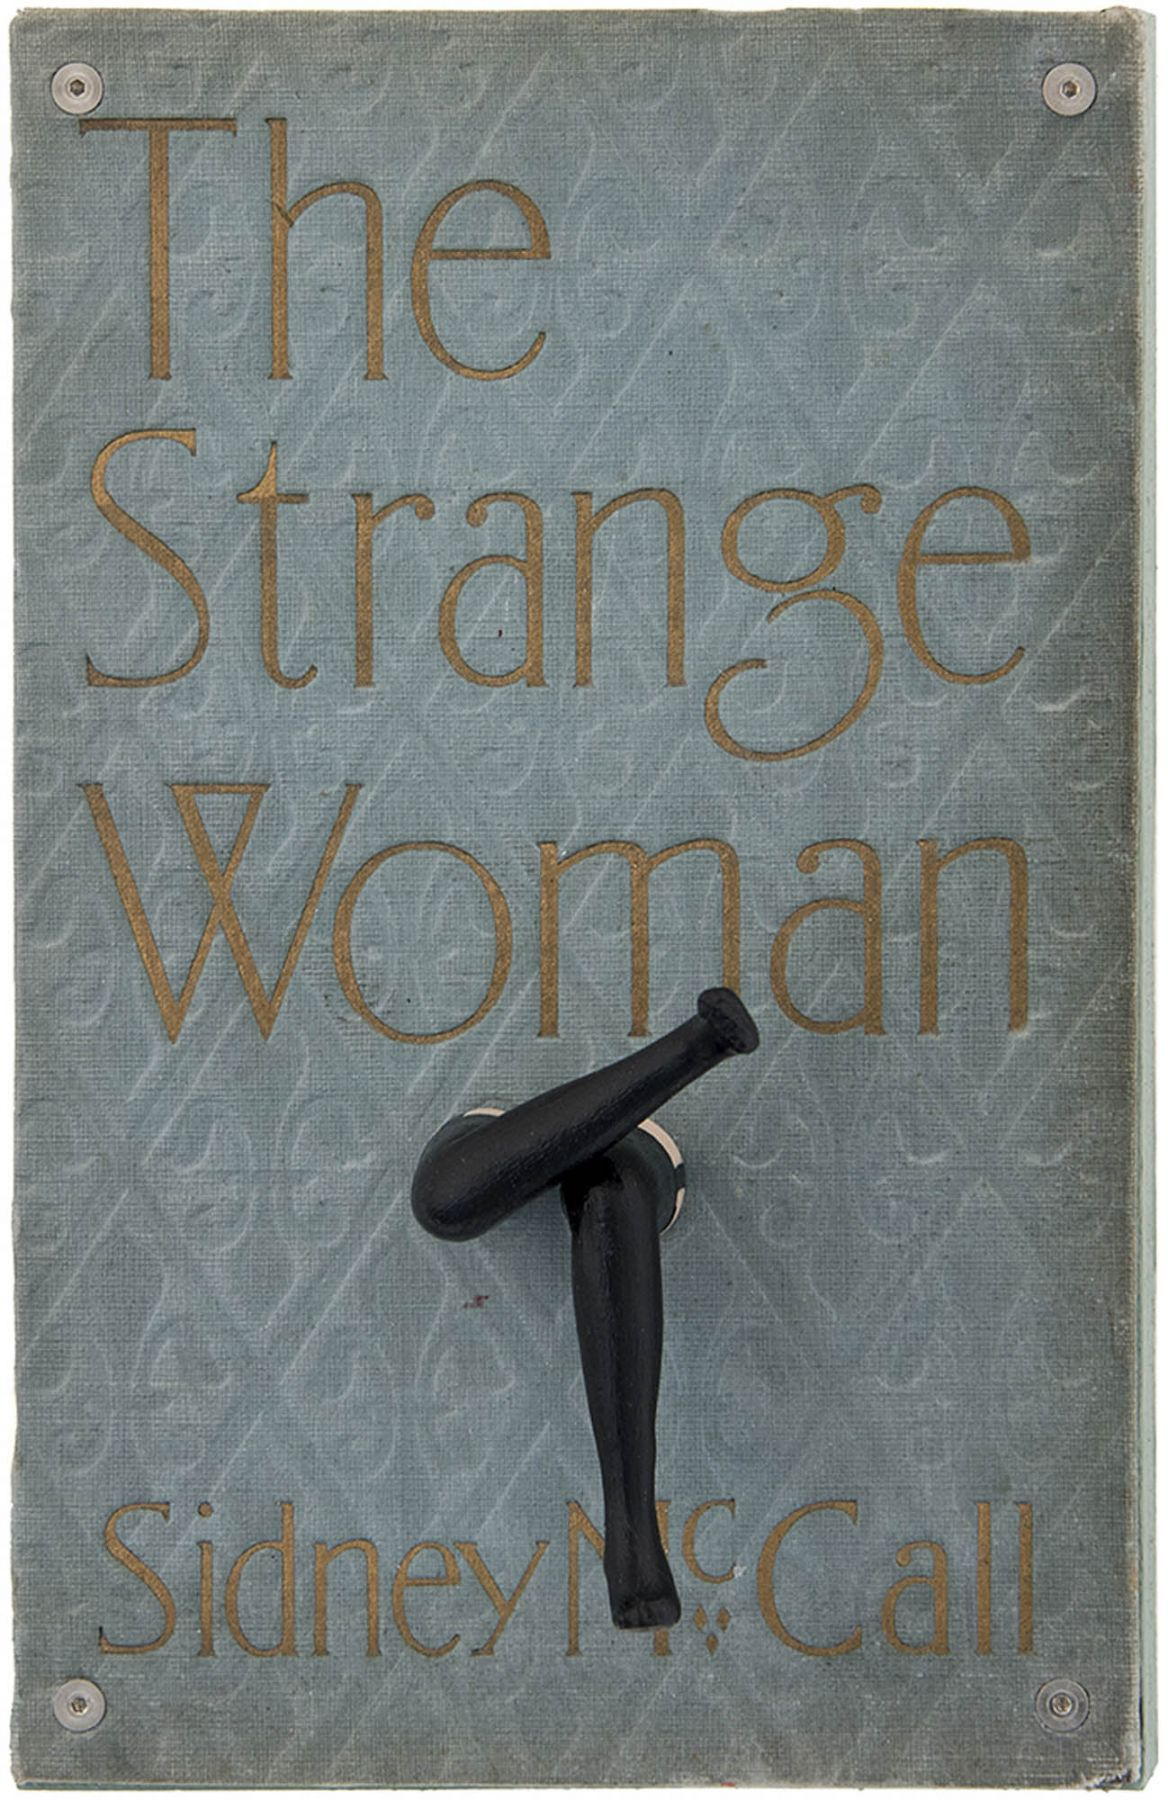 Nancy Gifford, The Strange Woman - #metoo Series, 2017